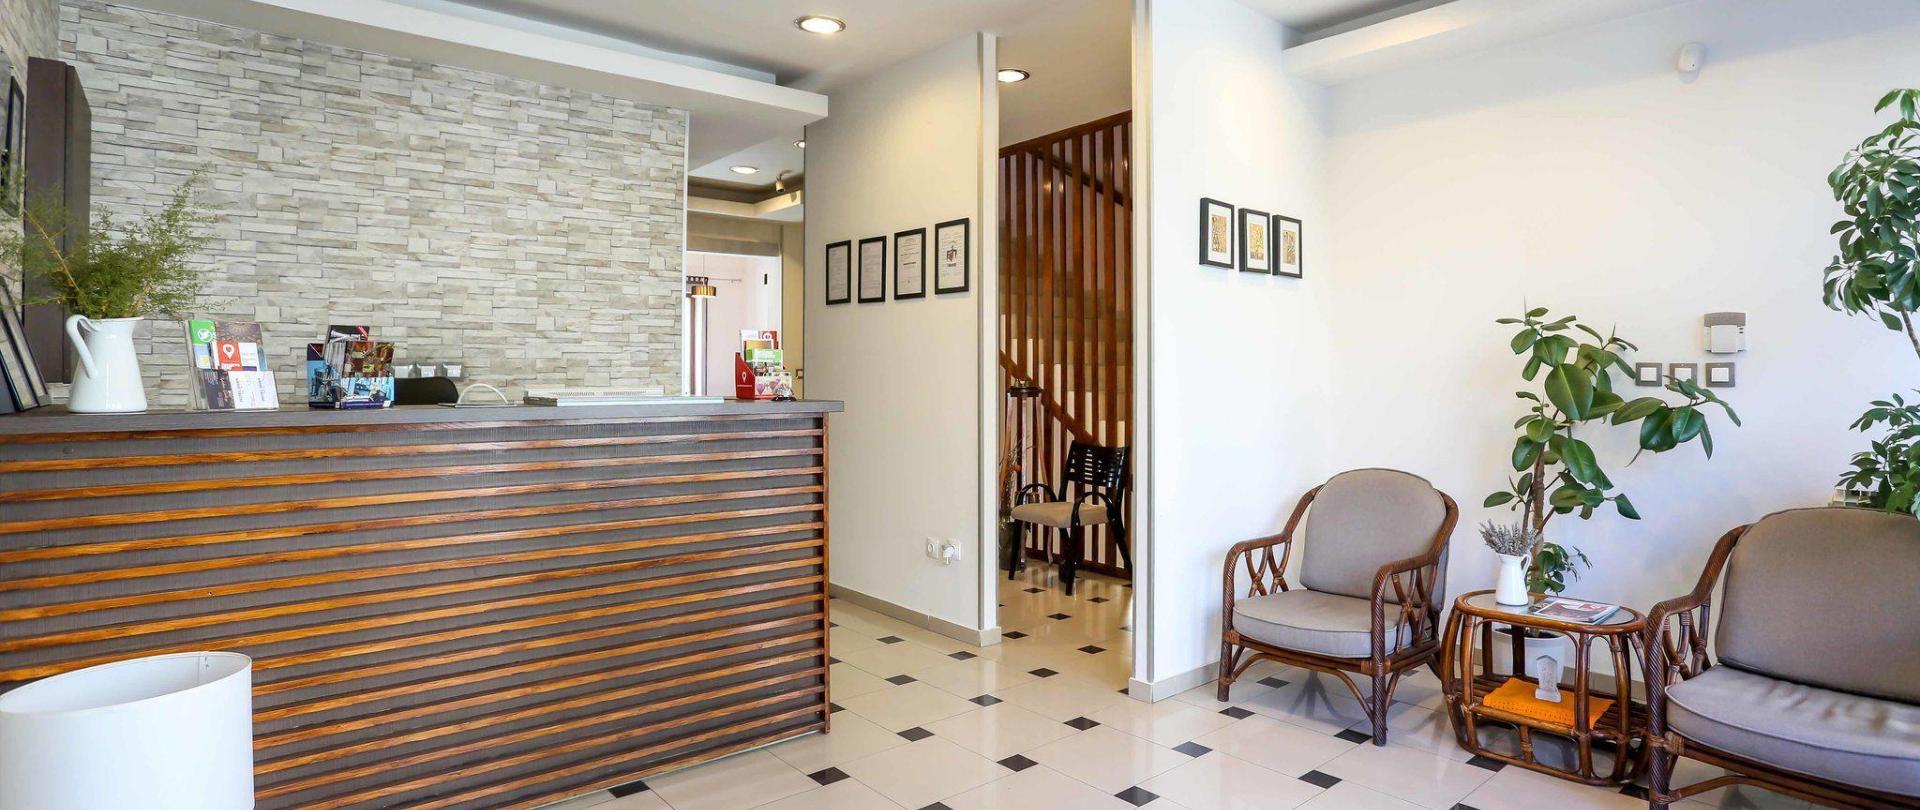 hotel-divan-by-dzenat-drekovic-29-08-2016-8.jpg